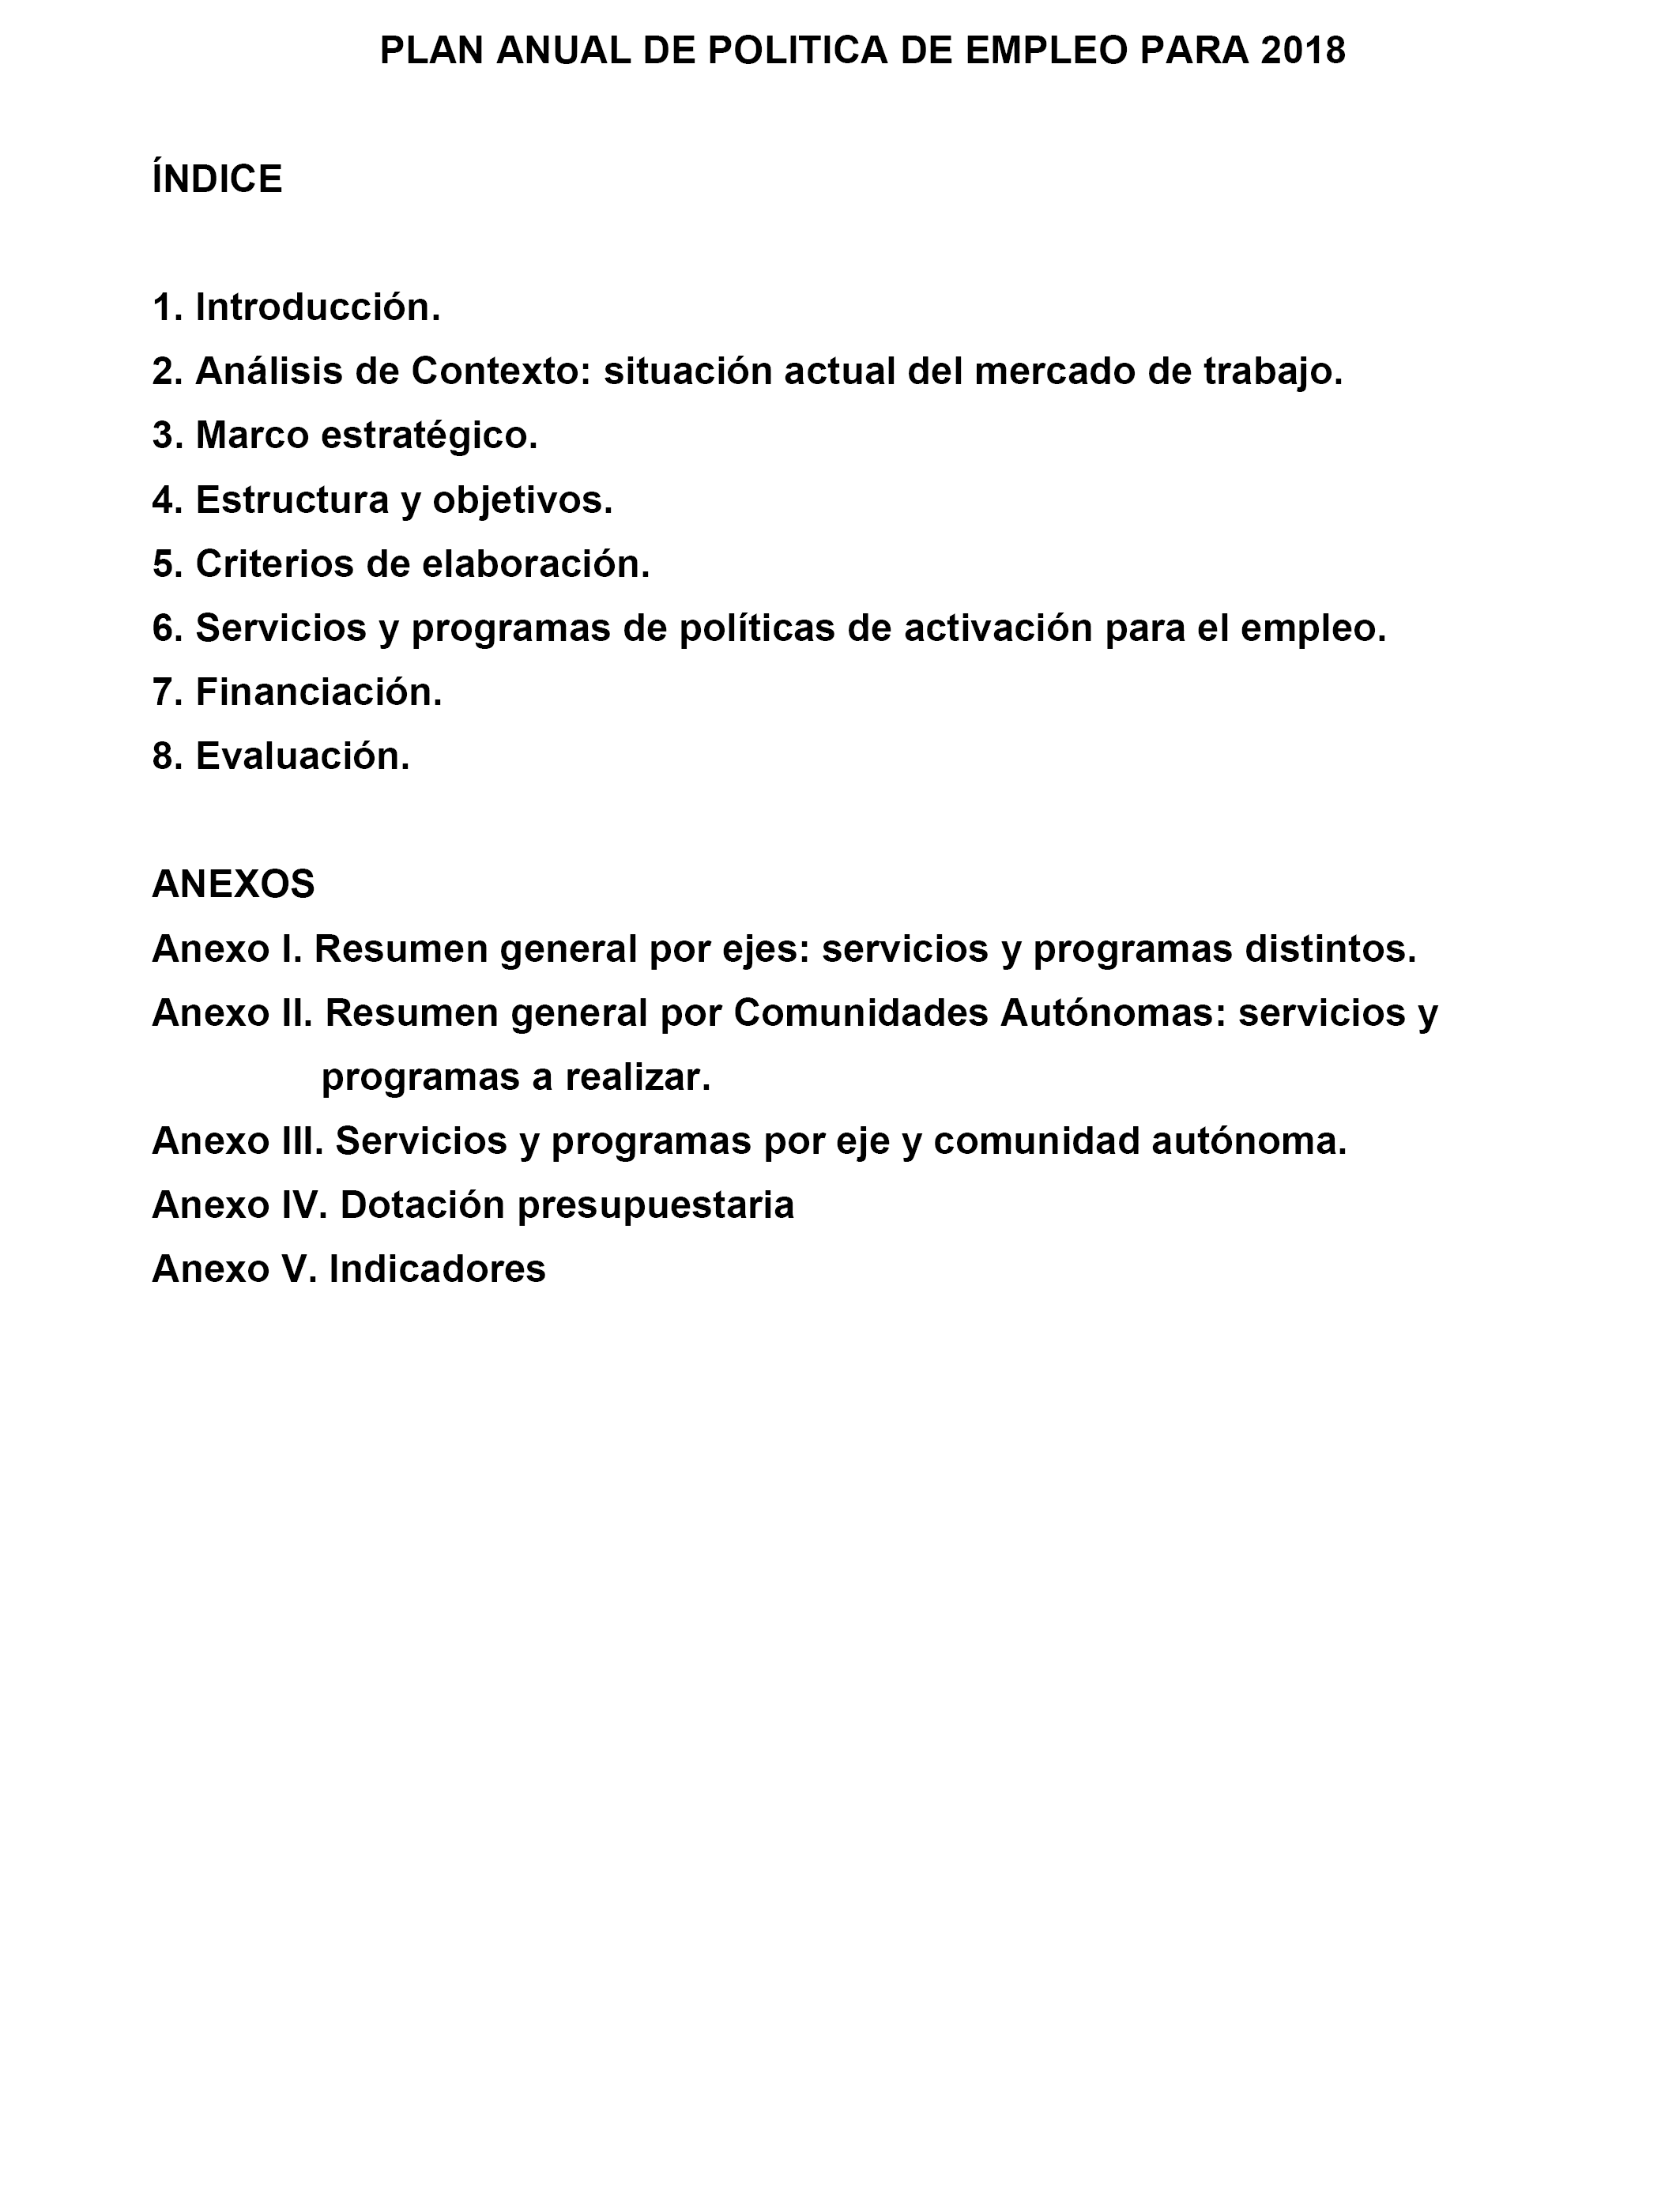 BOE.es - Documento BOE-A-2018-4390